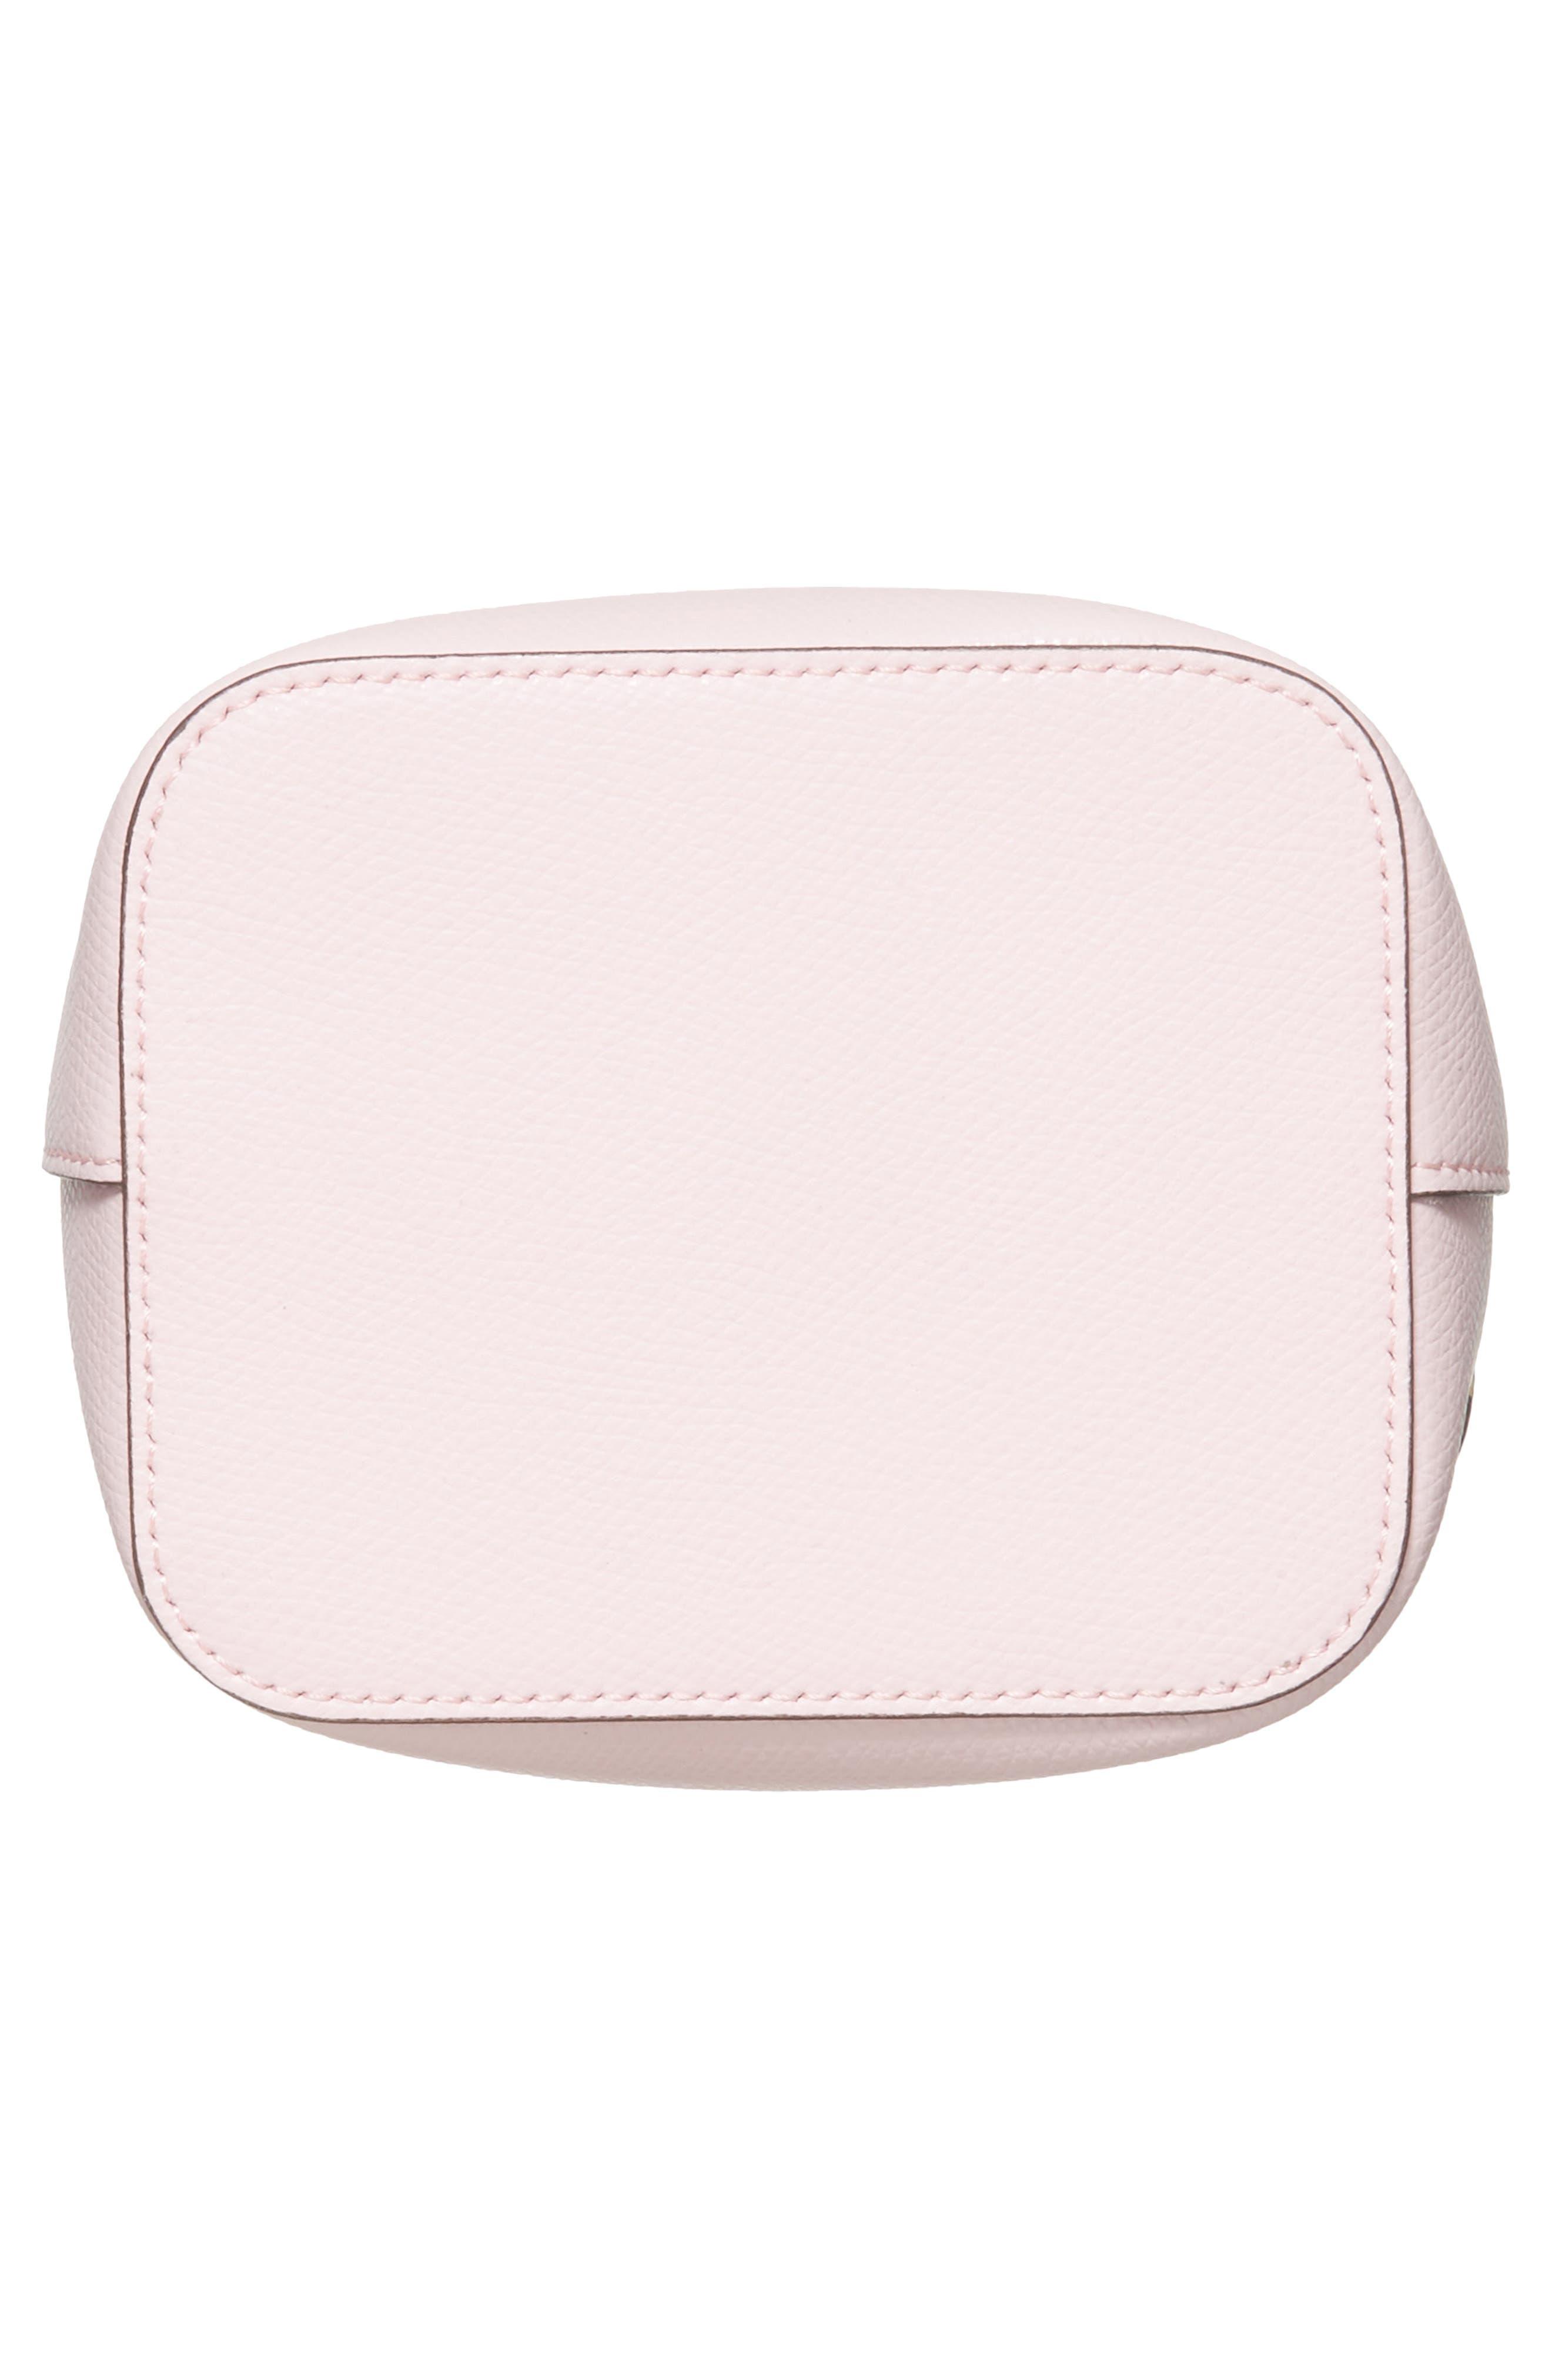 Mini Leather Bucket Bag,                             Alternate thumbnail 12, color,